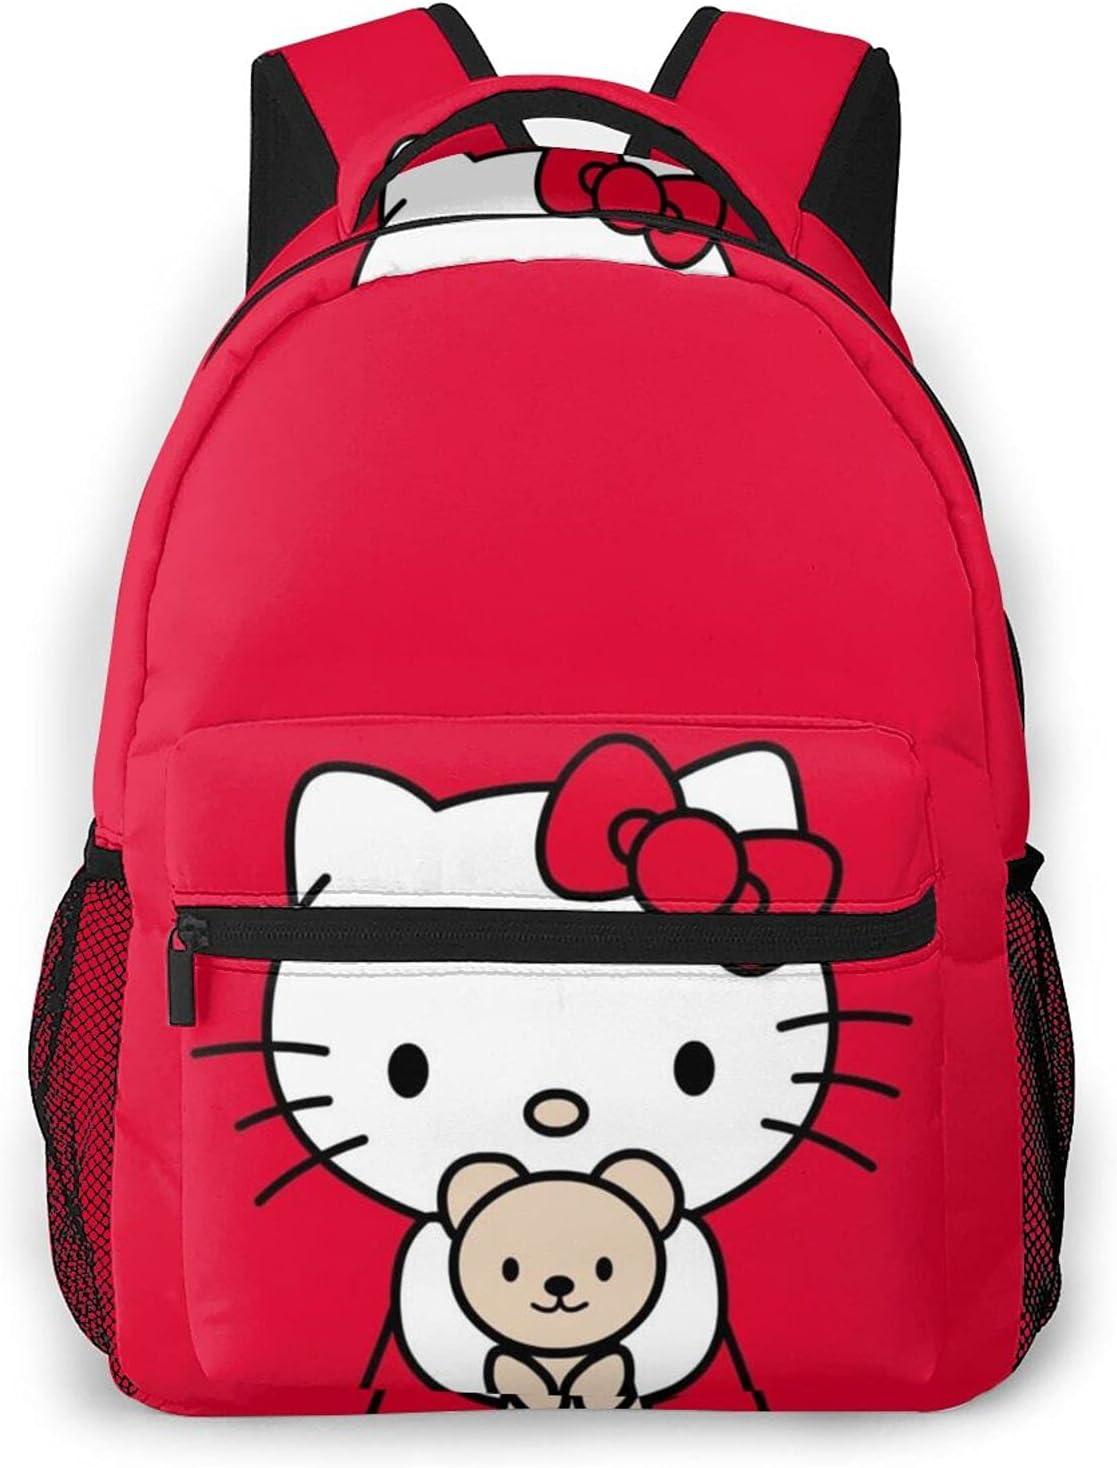 Hello Kitty Backpack Travel College Shoulder Bag for Girls Women